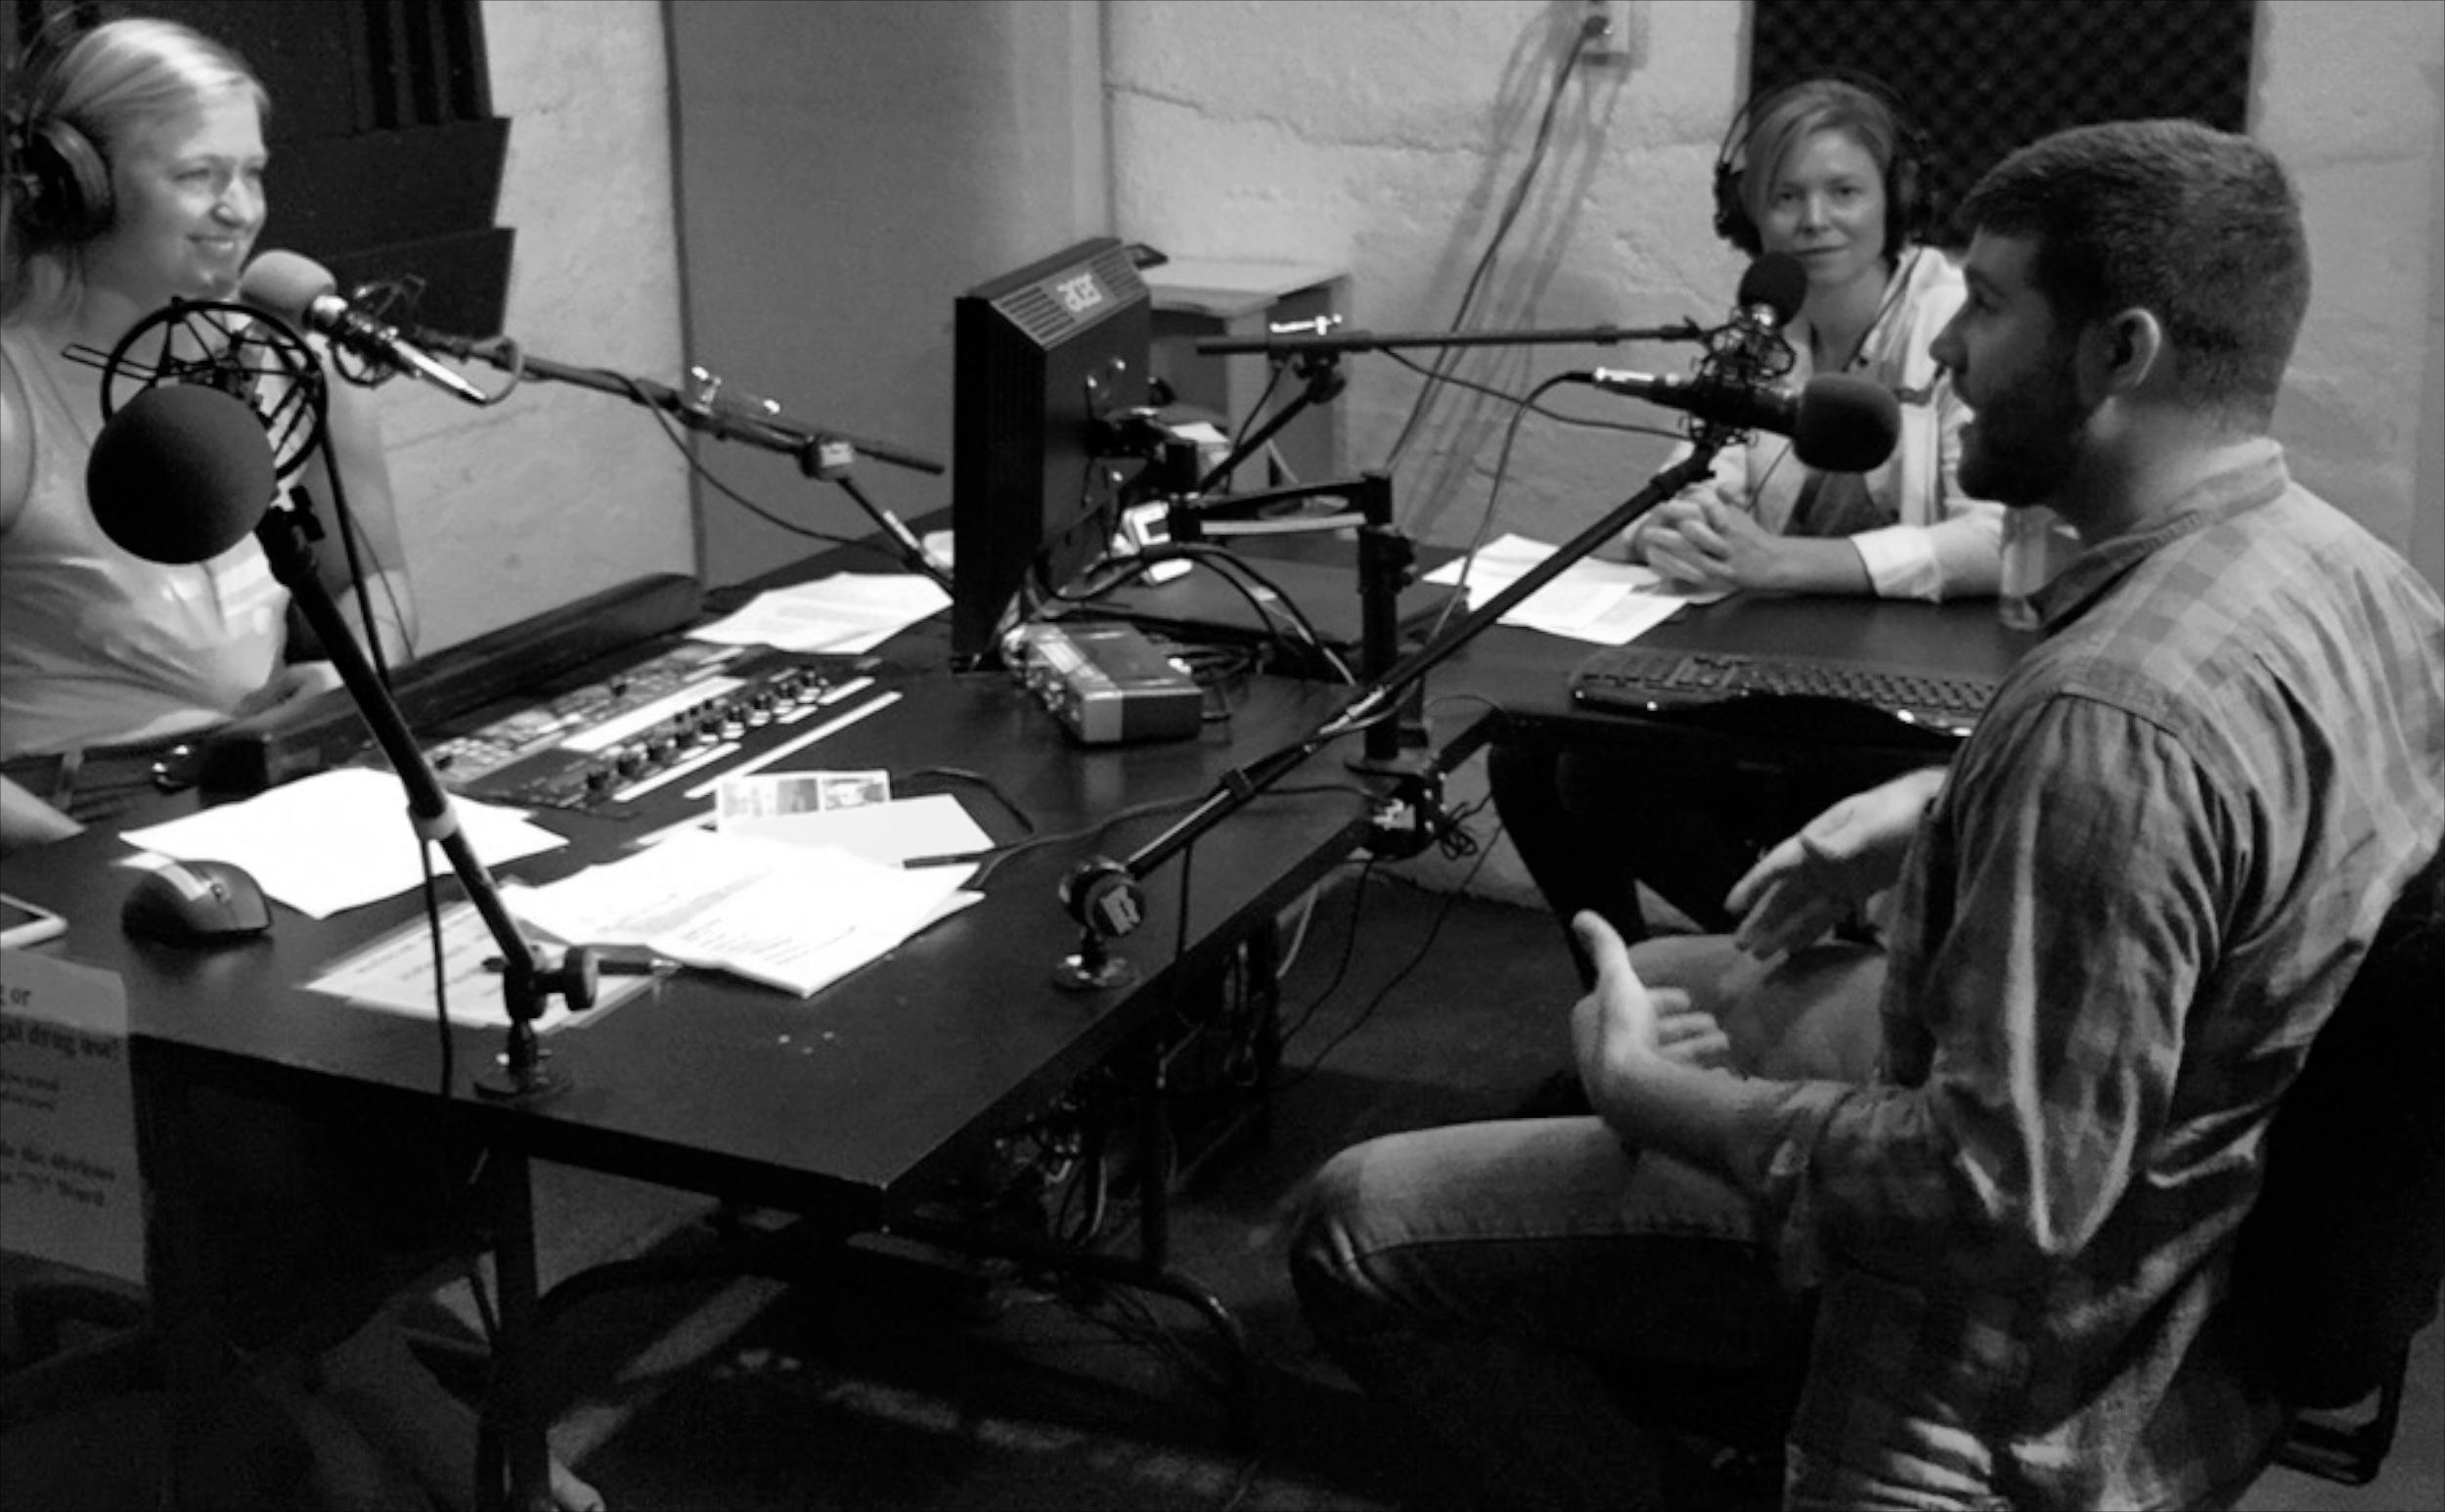 Caleb Kilburn interview